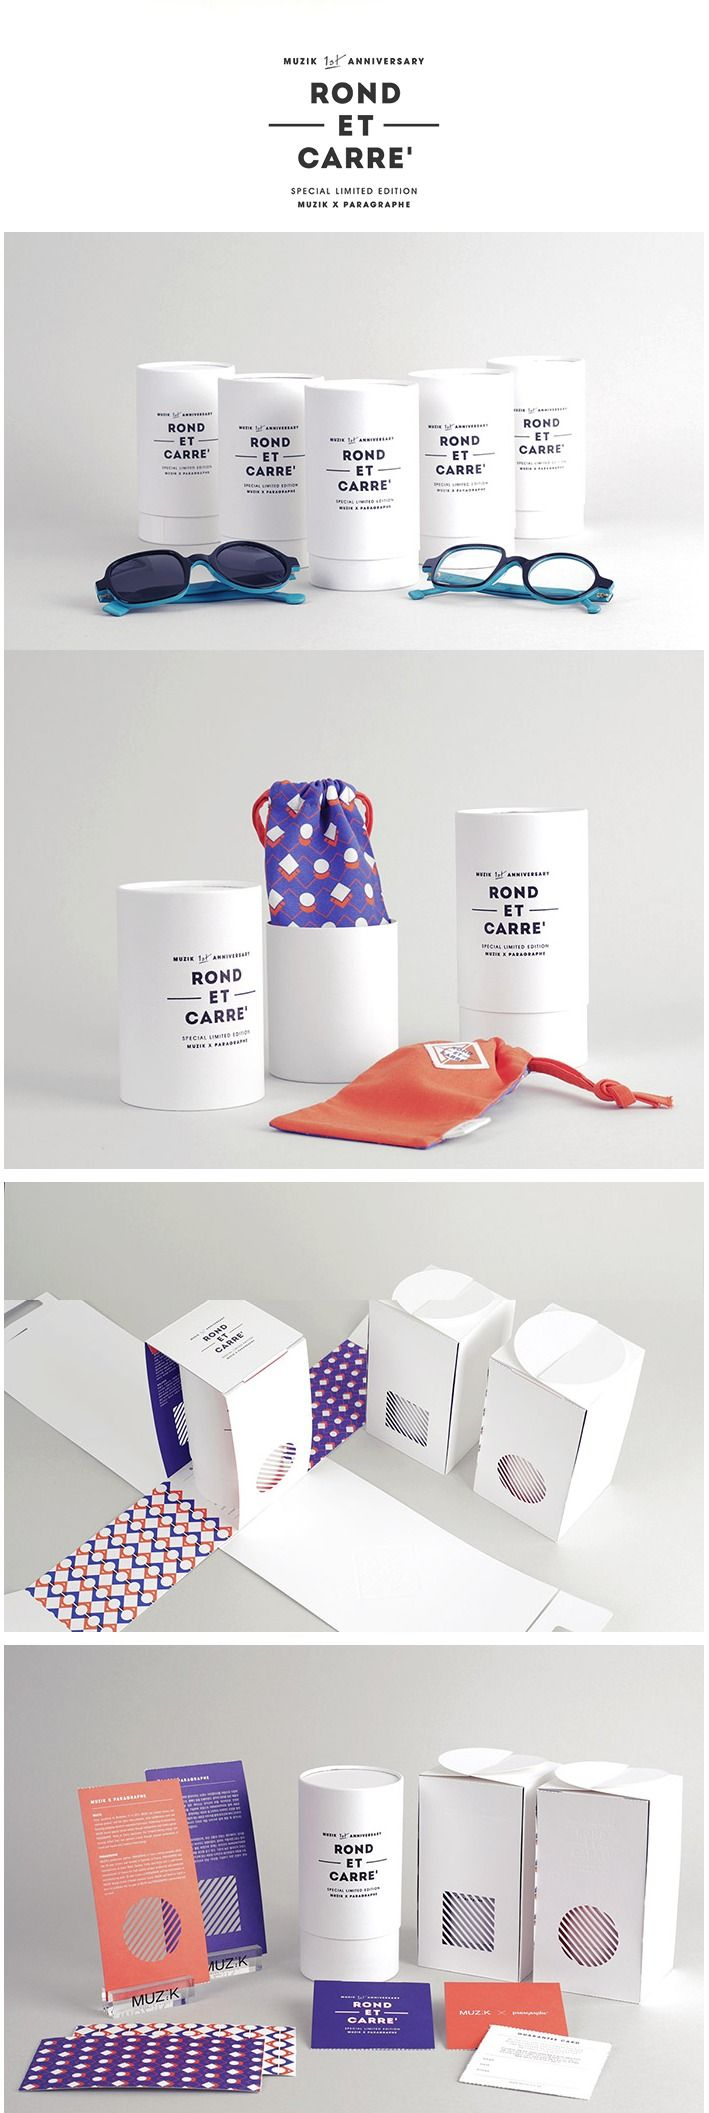 Designed by: MUZIK STUDIO, Korea. #sunglasses #package #whitedesign